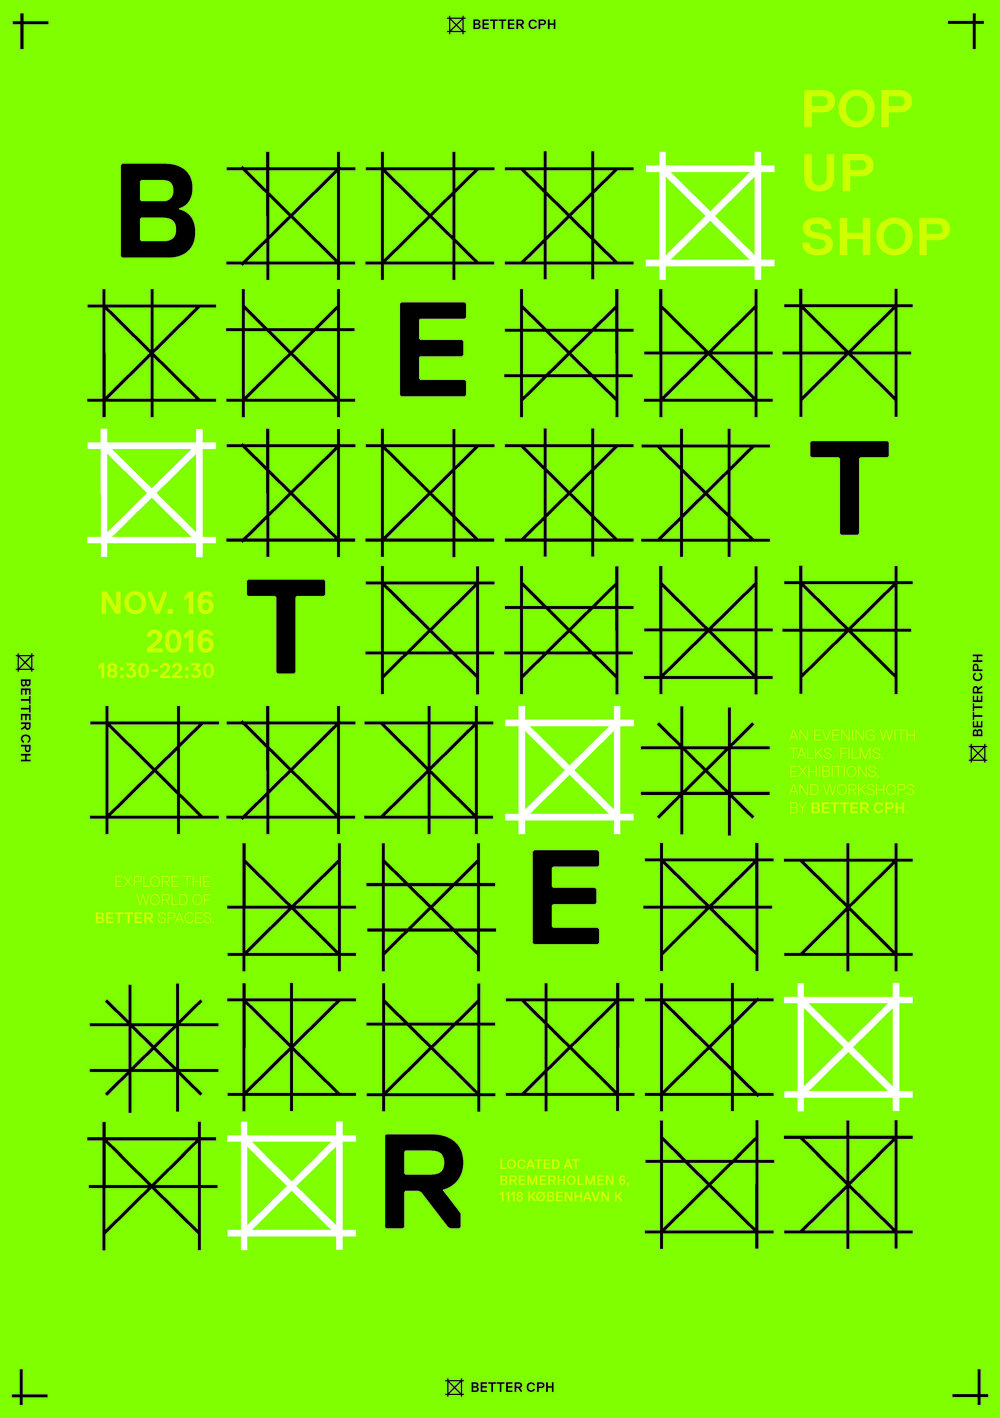 bettercph_popupshop_poster.jpg